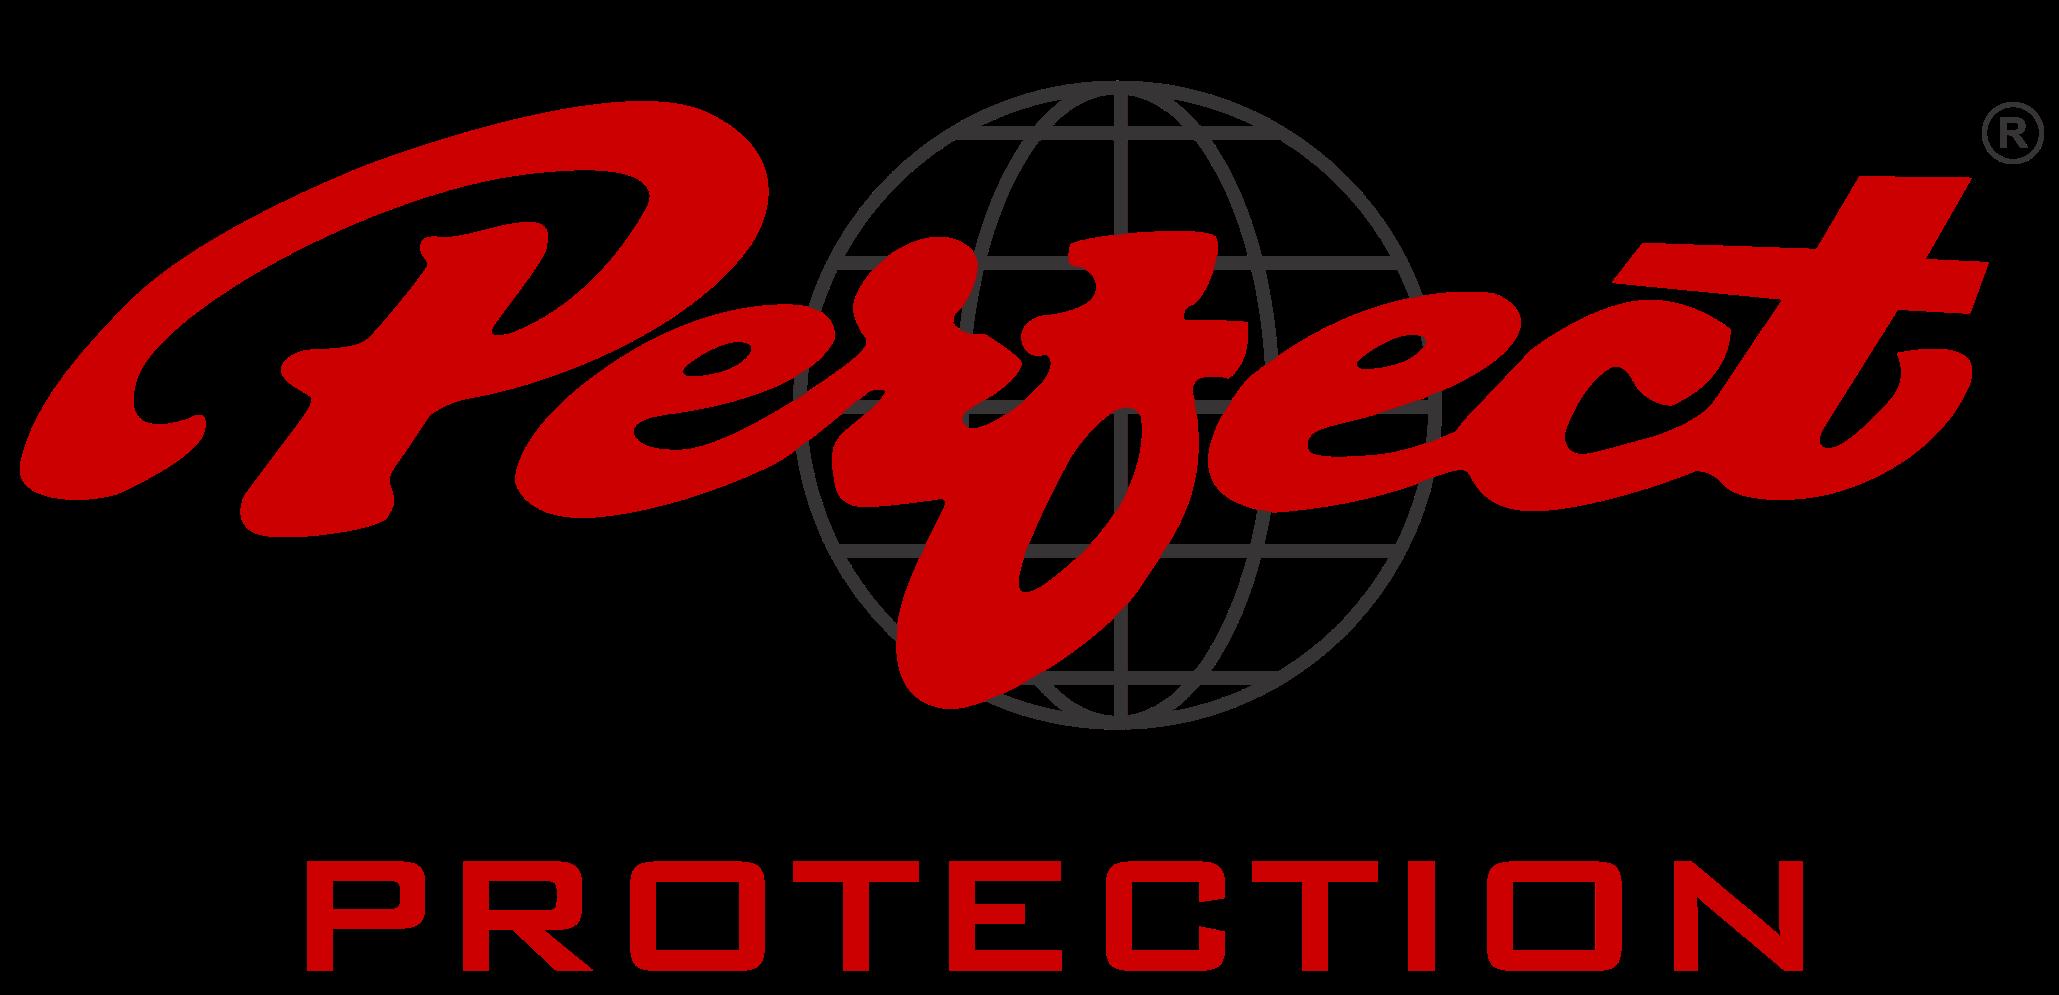 Perfect Protection LLC